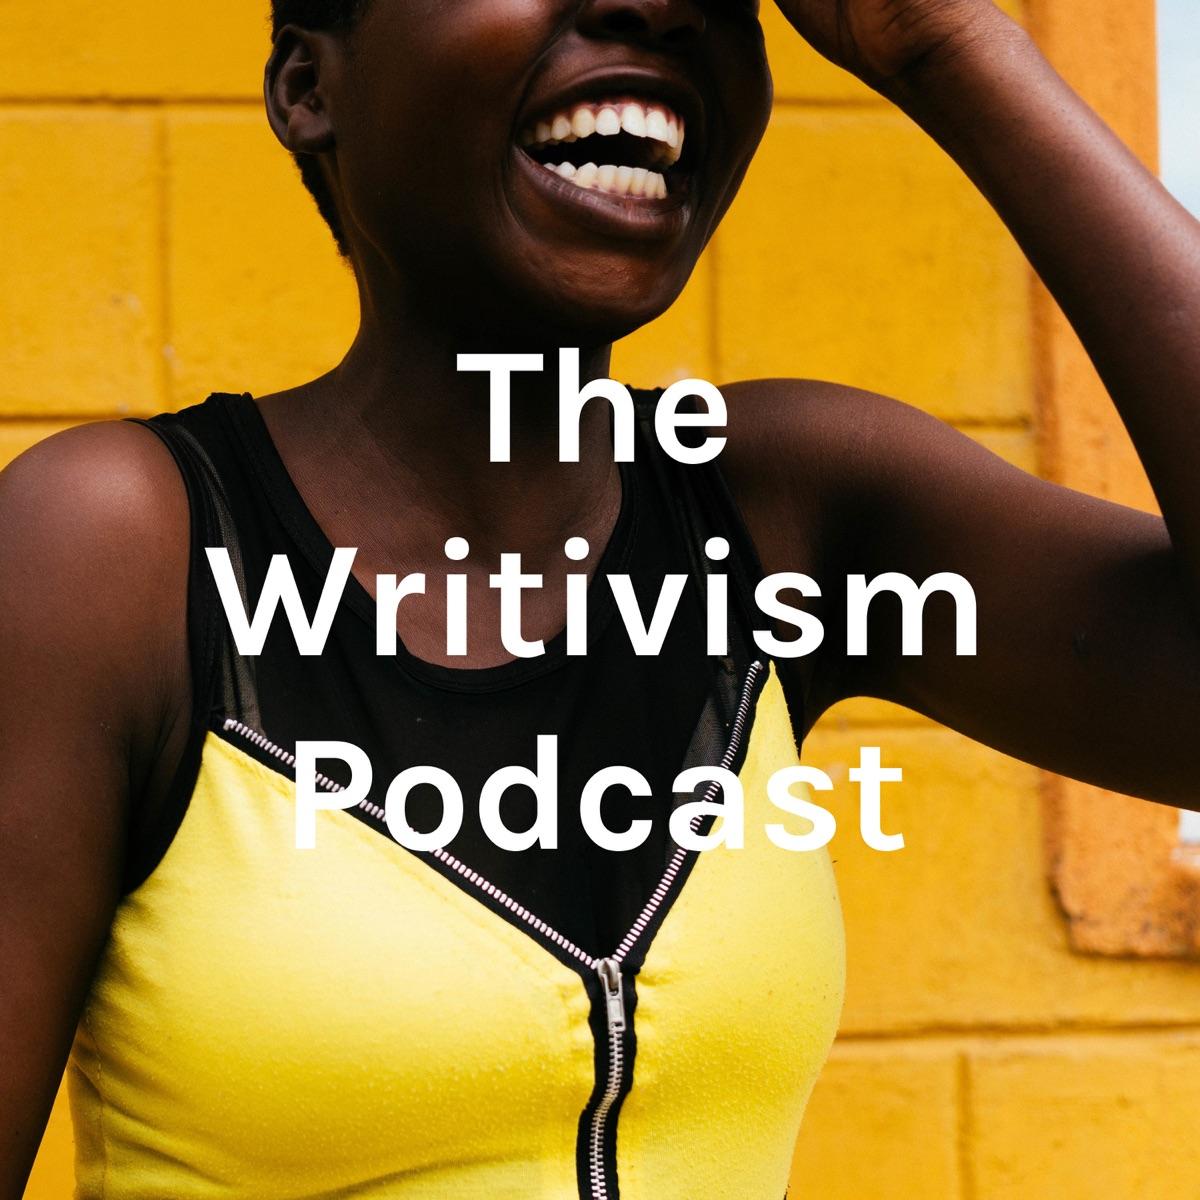 The Writivism Podcast